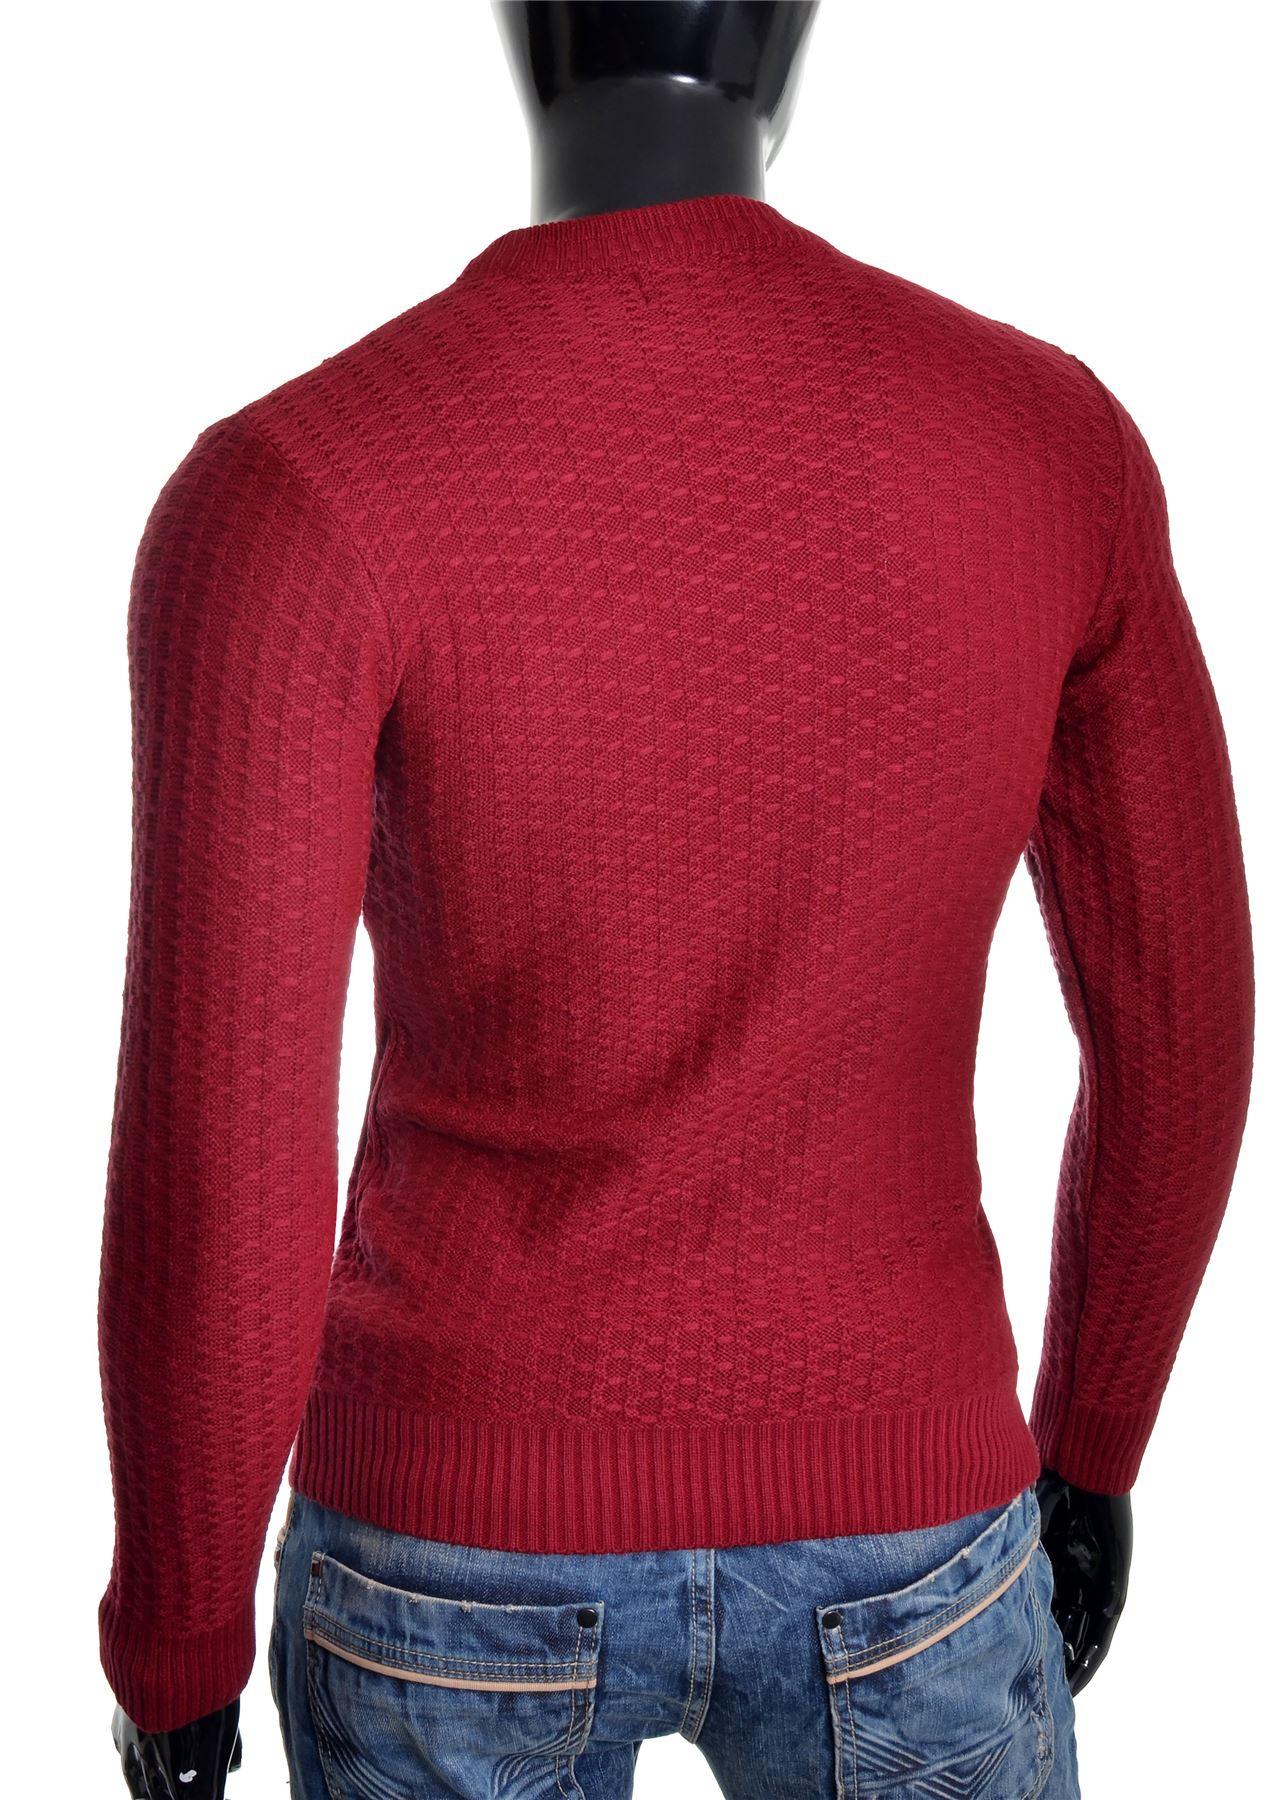 D-amp-R-Men-039-s-Wool-Knit-Jumper-Smart-Long-Sleeve-Sweater-Crew-Neck-Top thumbnail 16